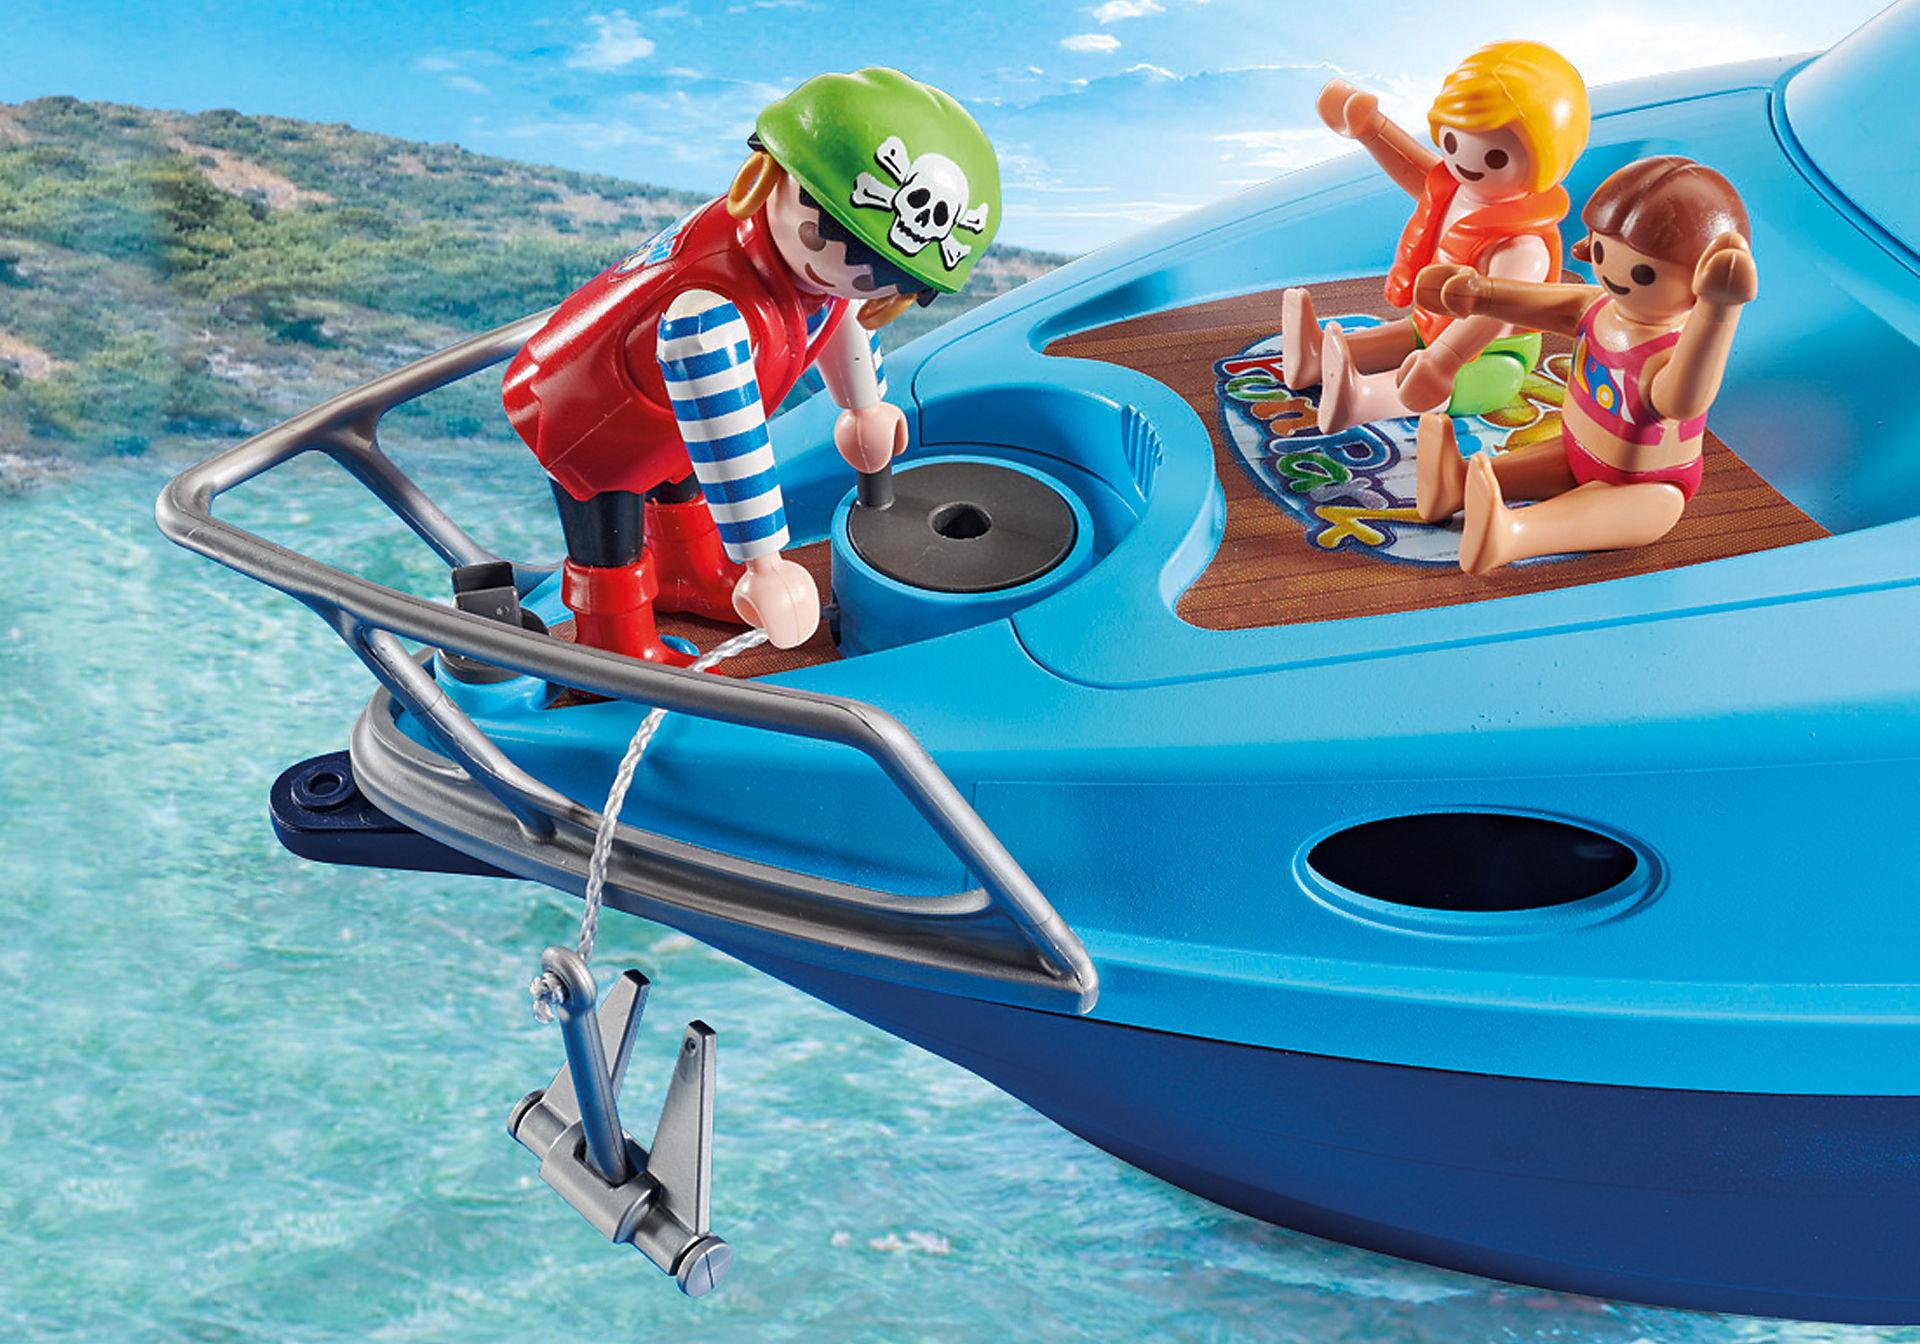 70630 PLAYMOBL-FunPark Yate con moto de agua zoom image4